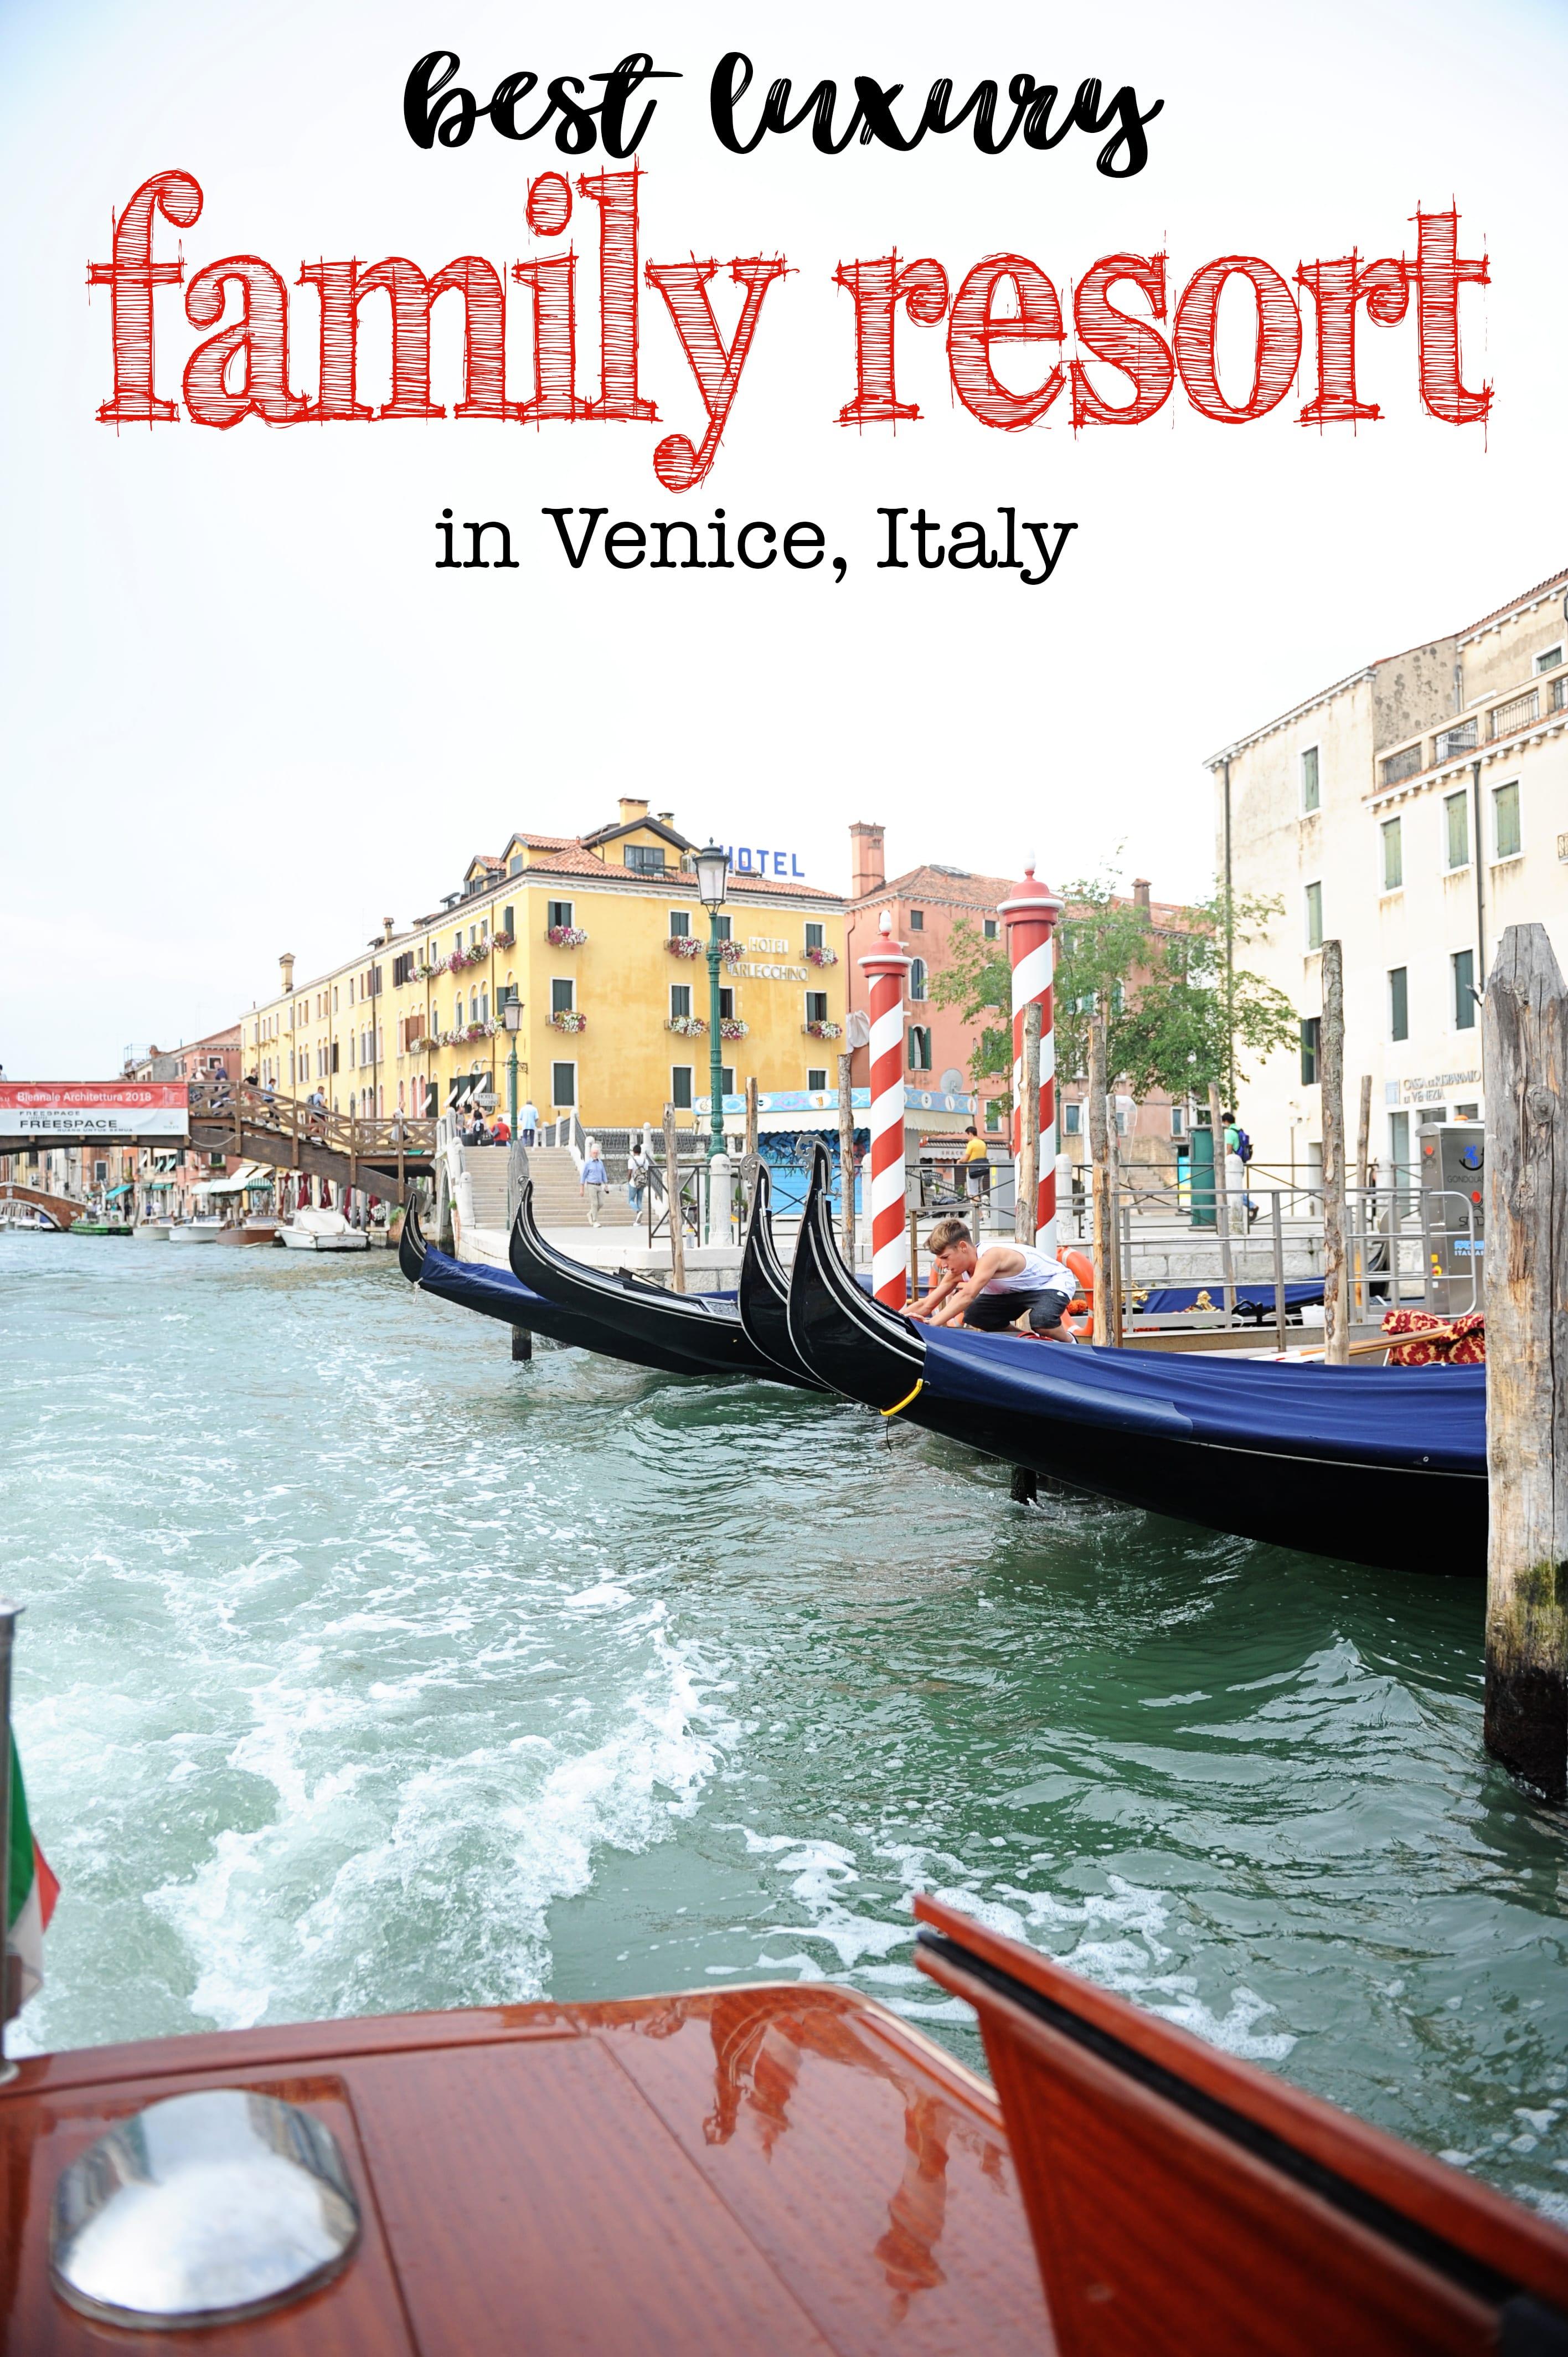 Isola delle Rose Venezia : JW Marriott Venice Italy : Best Family Hotels Venice